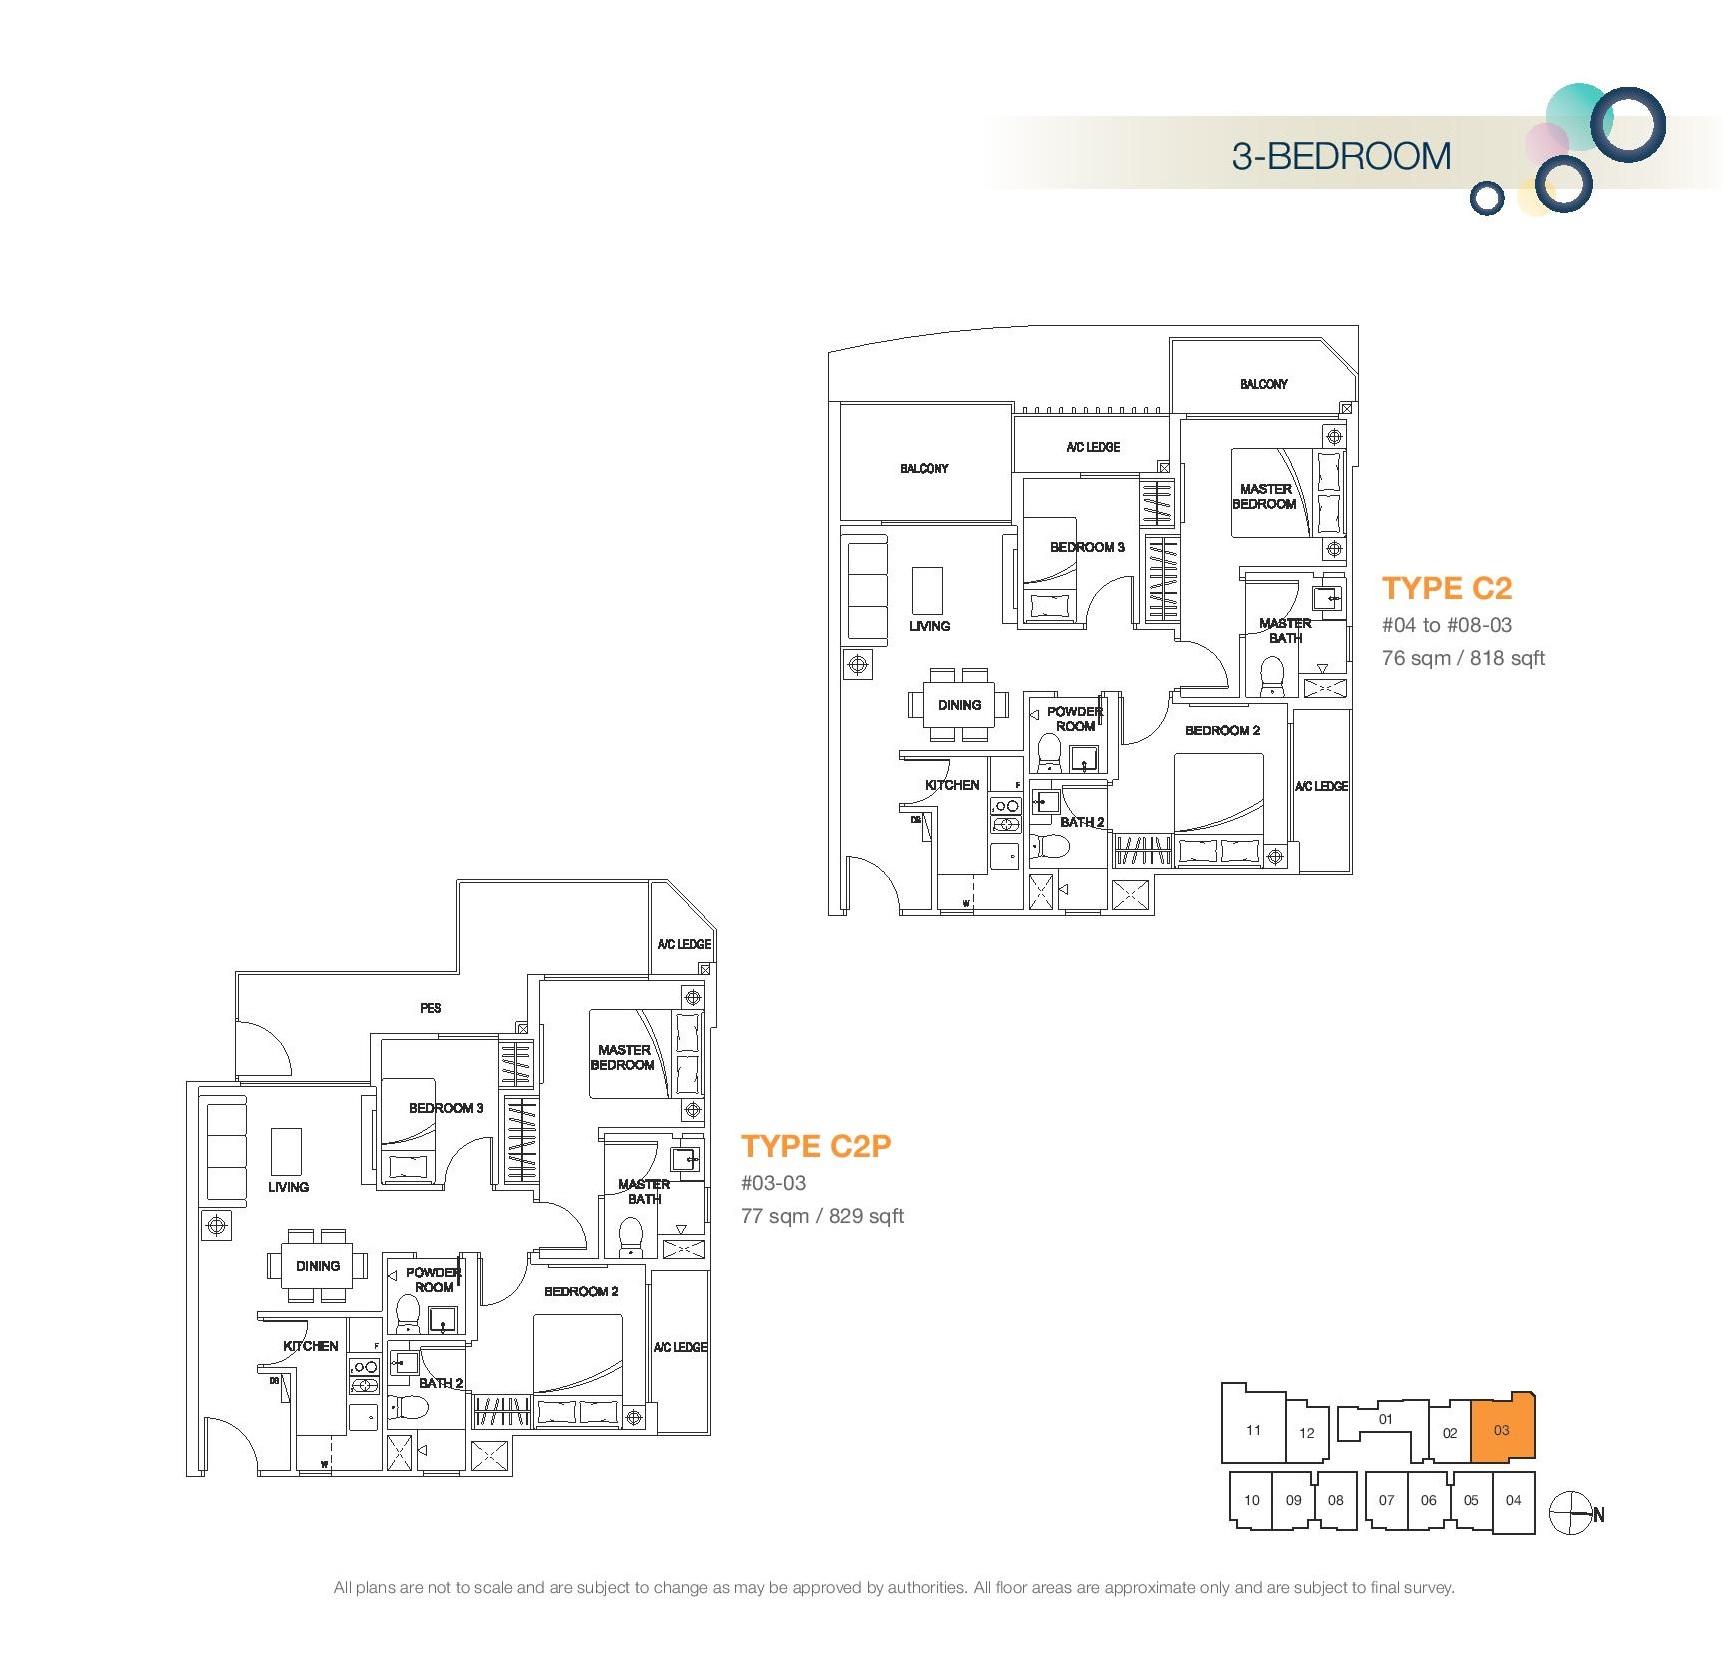 Rezi 3Two 3 Bedroom Floor Plans Type C2, C2P